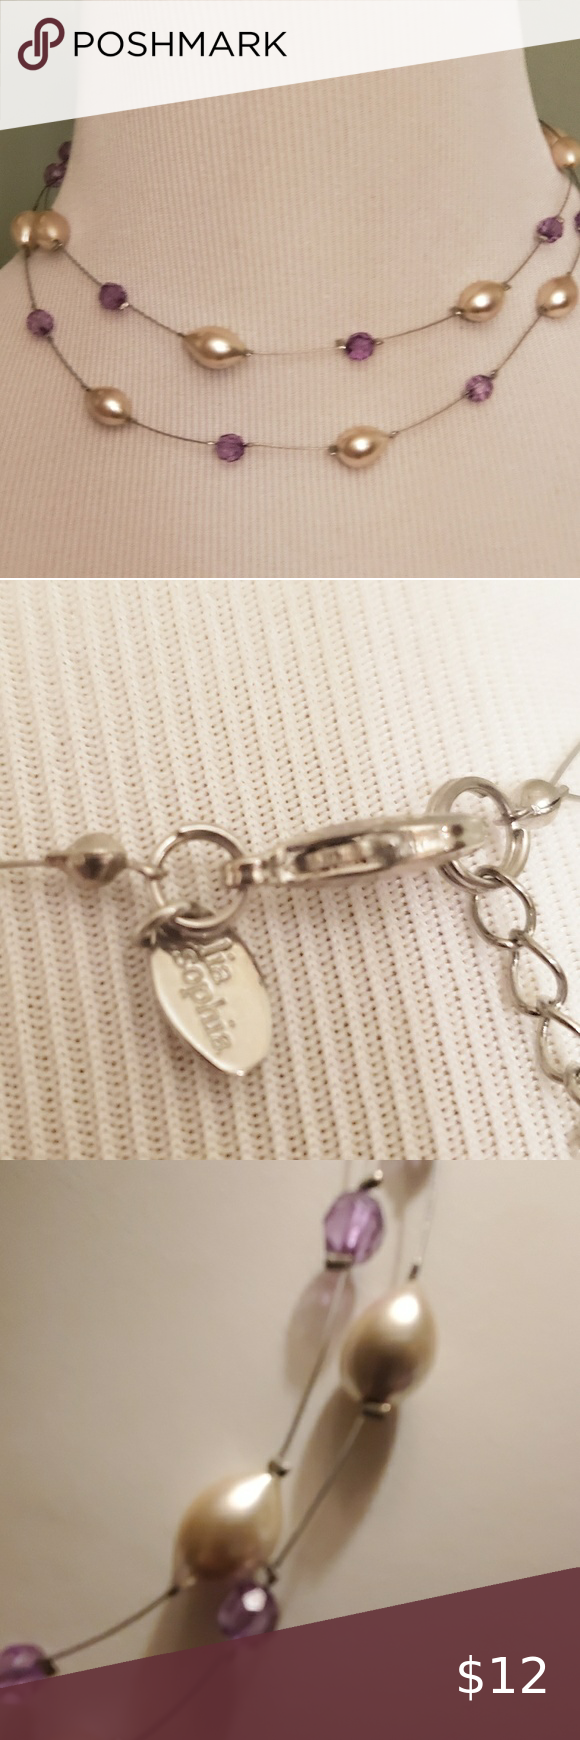 21++ Lia sophia jewelry for sale info